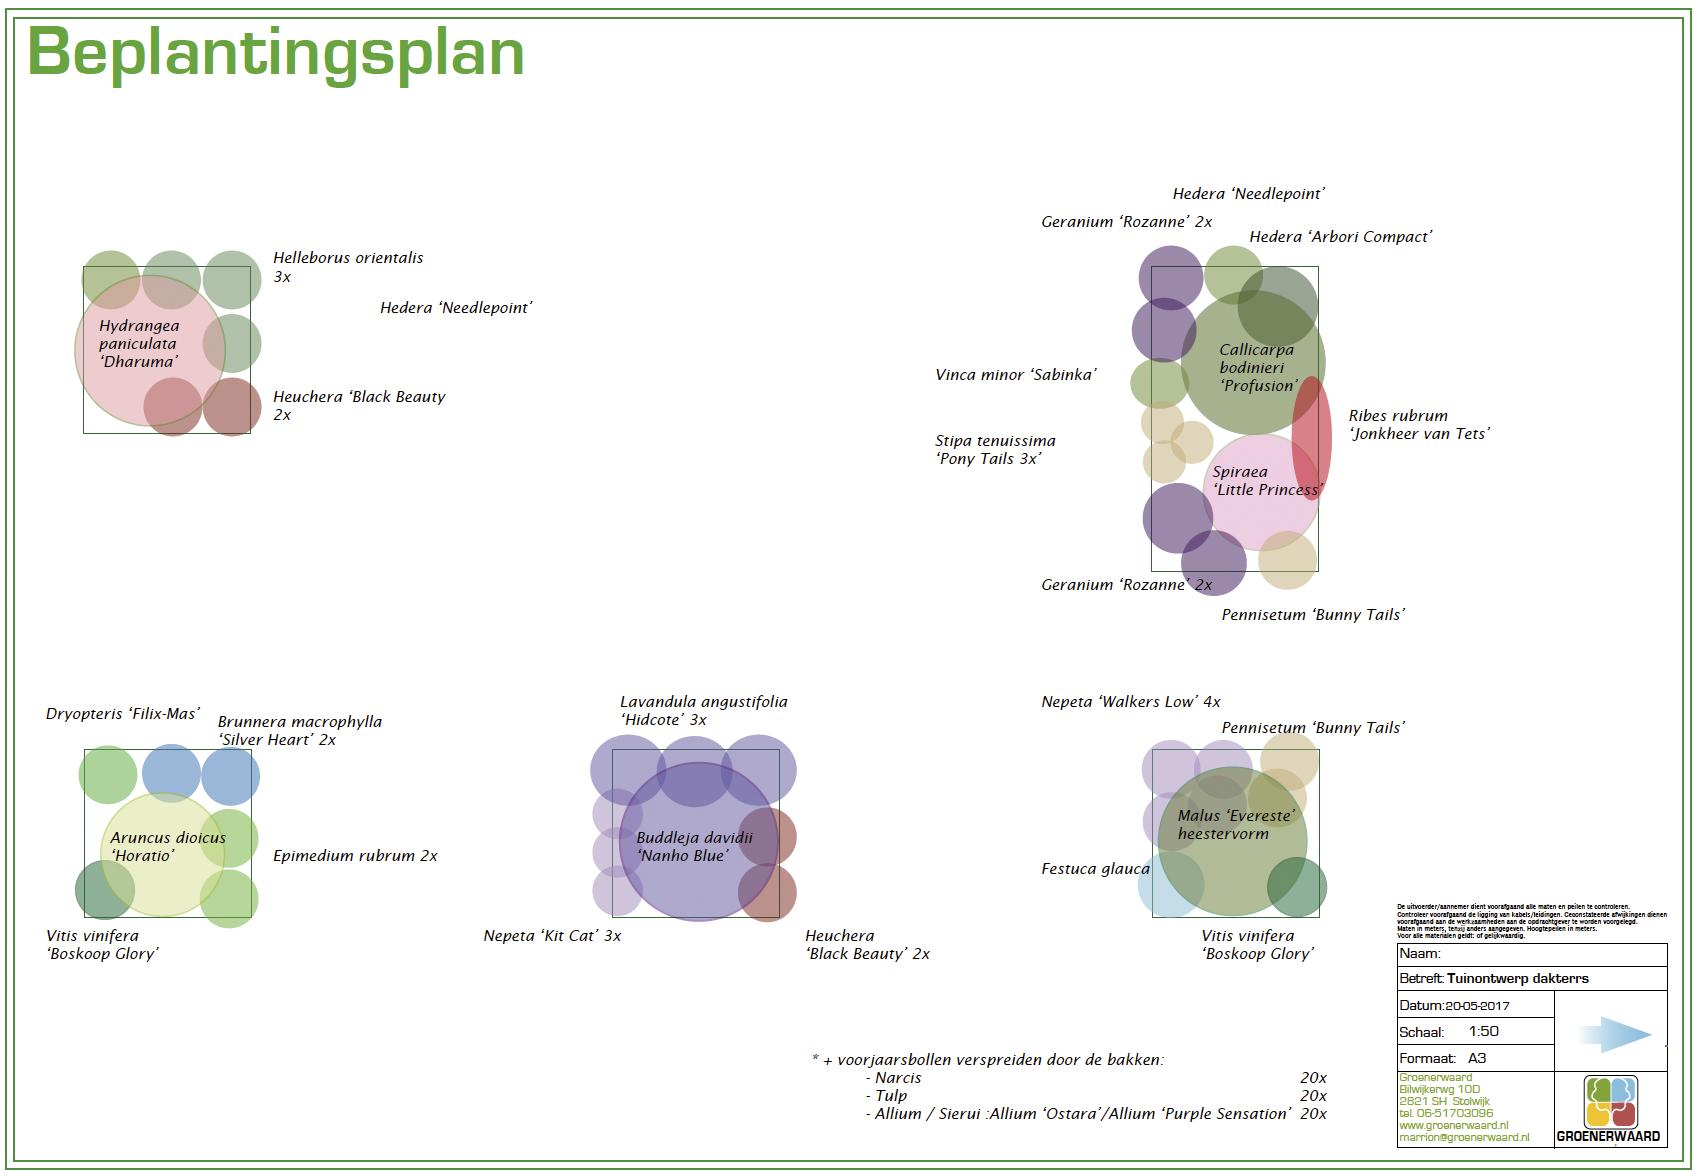 beplantingsplan dakterras daktuin bloembak ©Groenerwaard